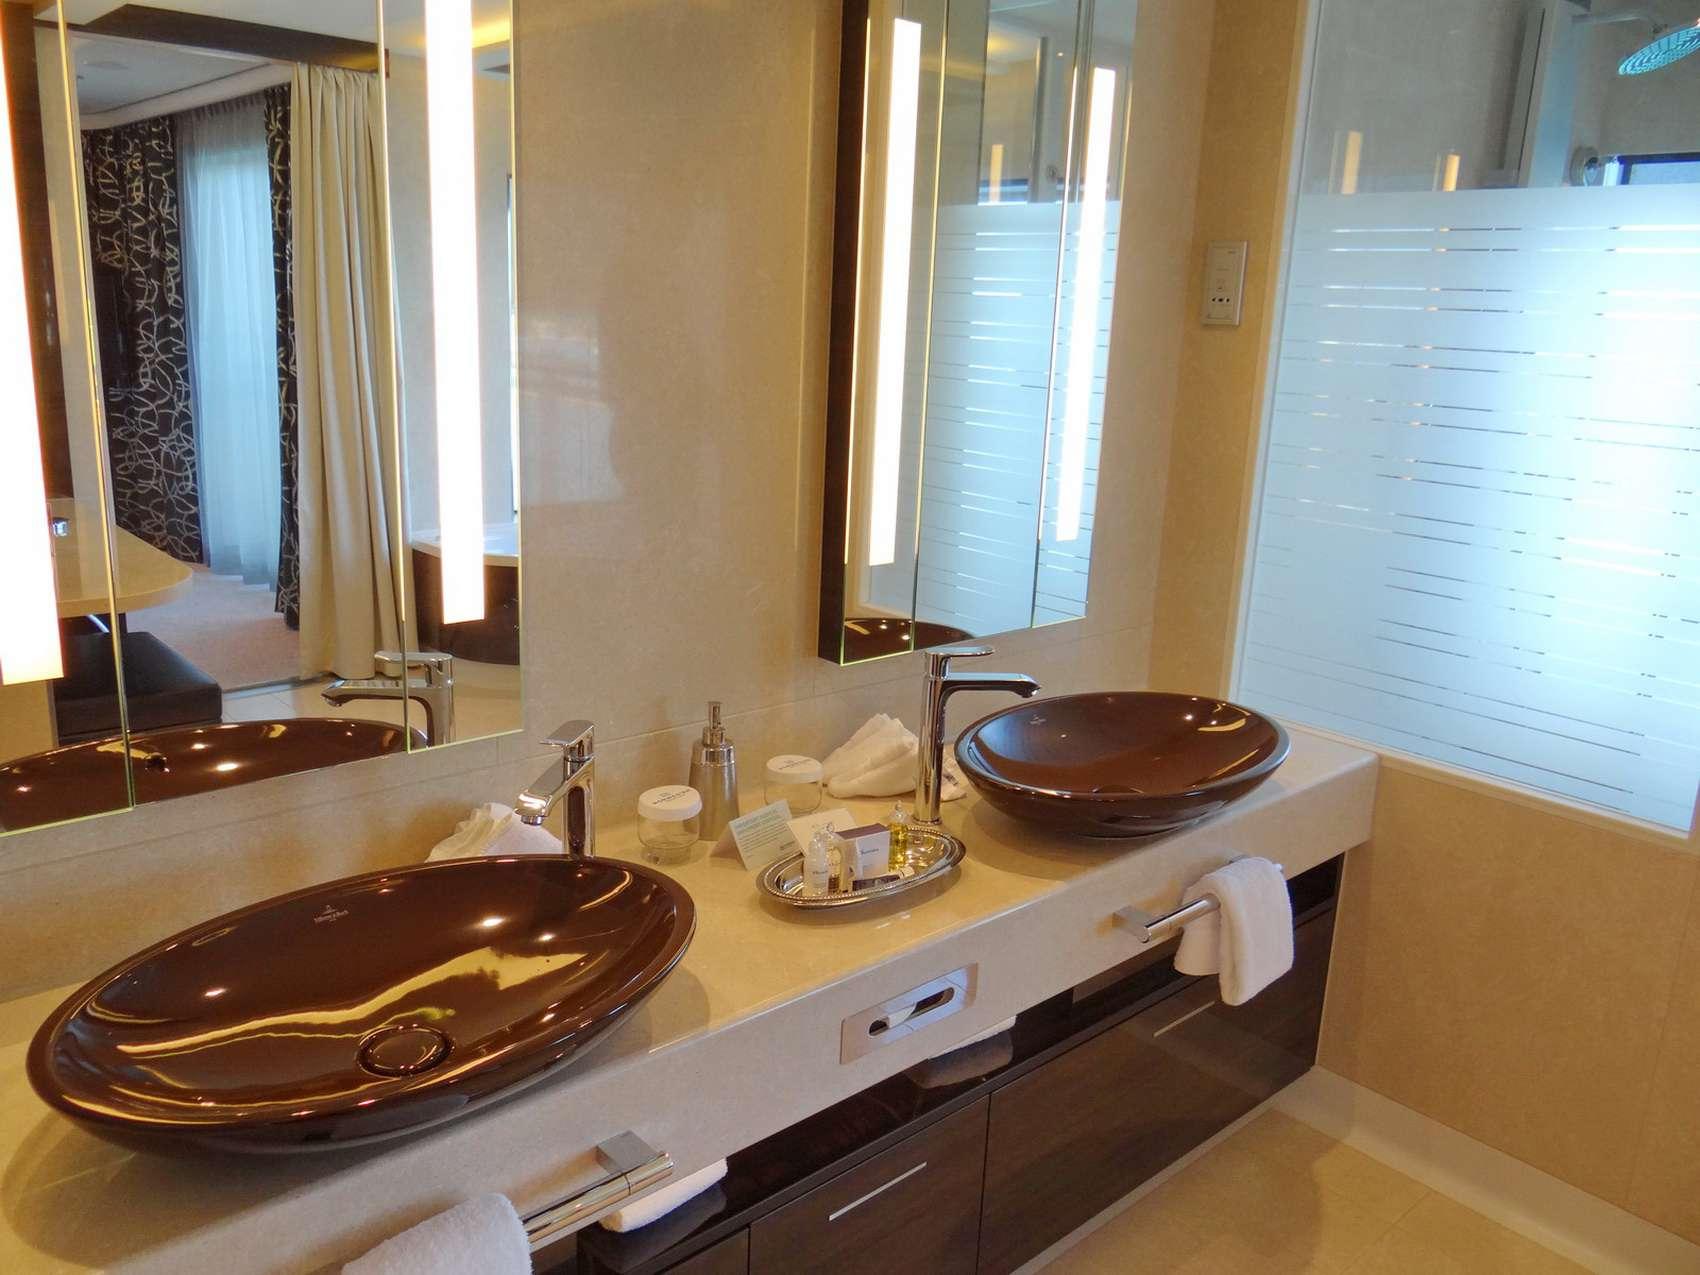 Bathroom in the deluxe owner's suite at The Haven on the Norwegian Getaway